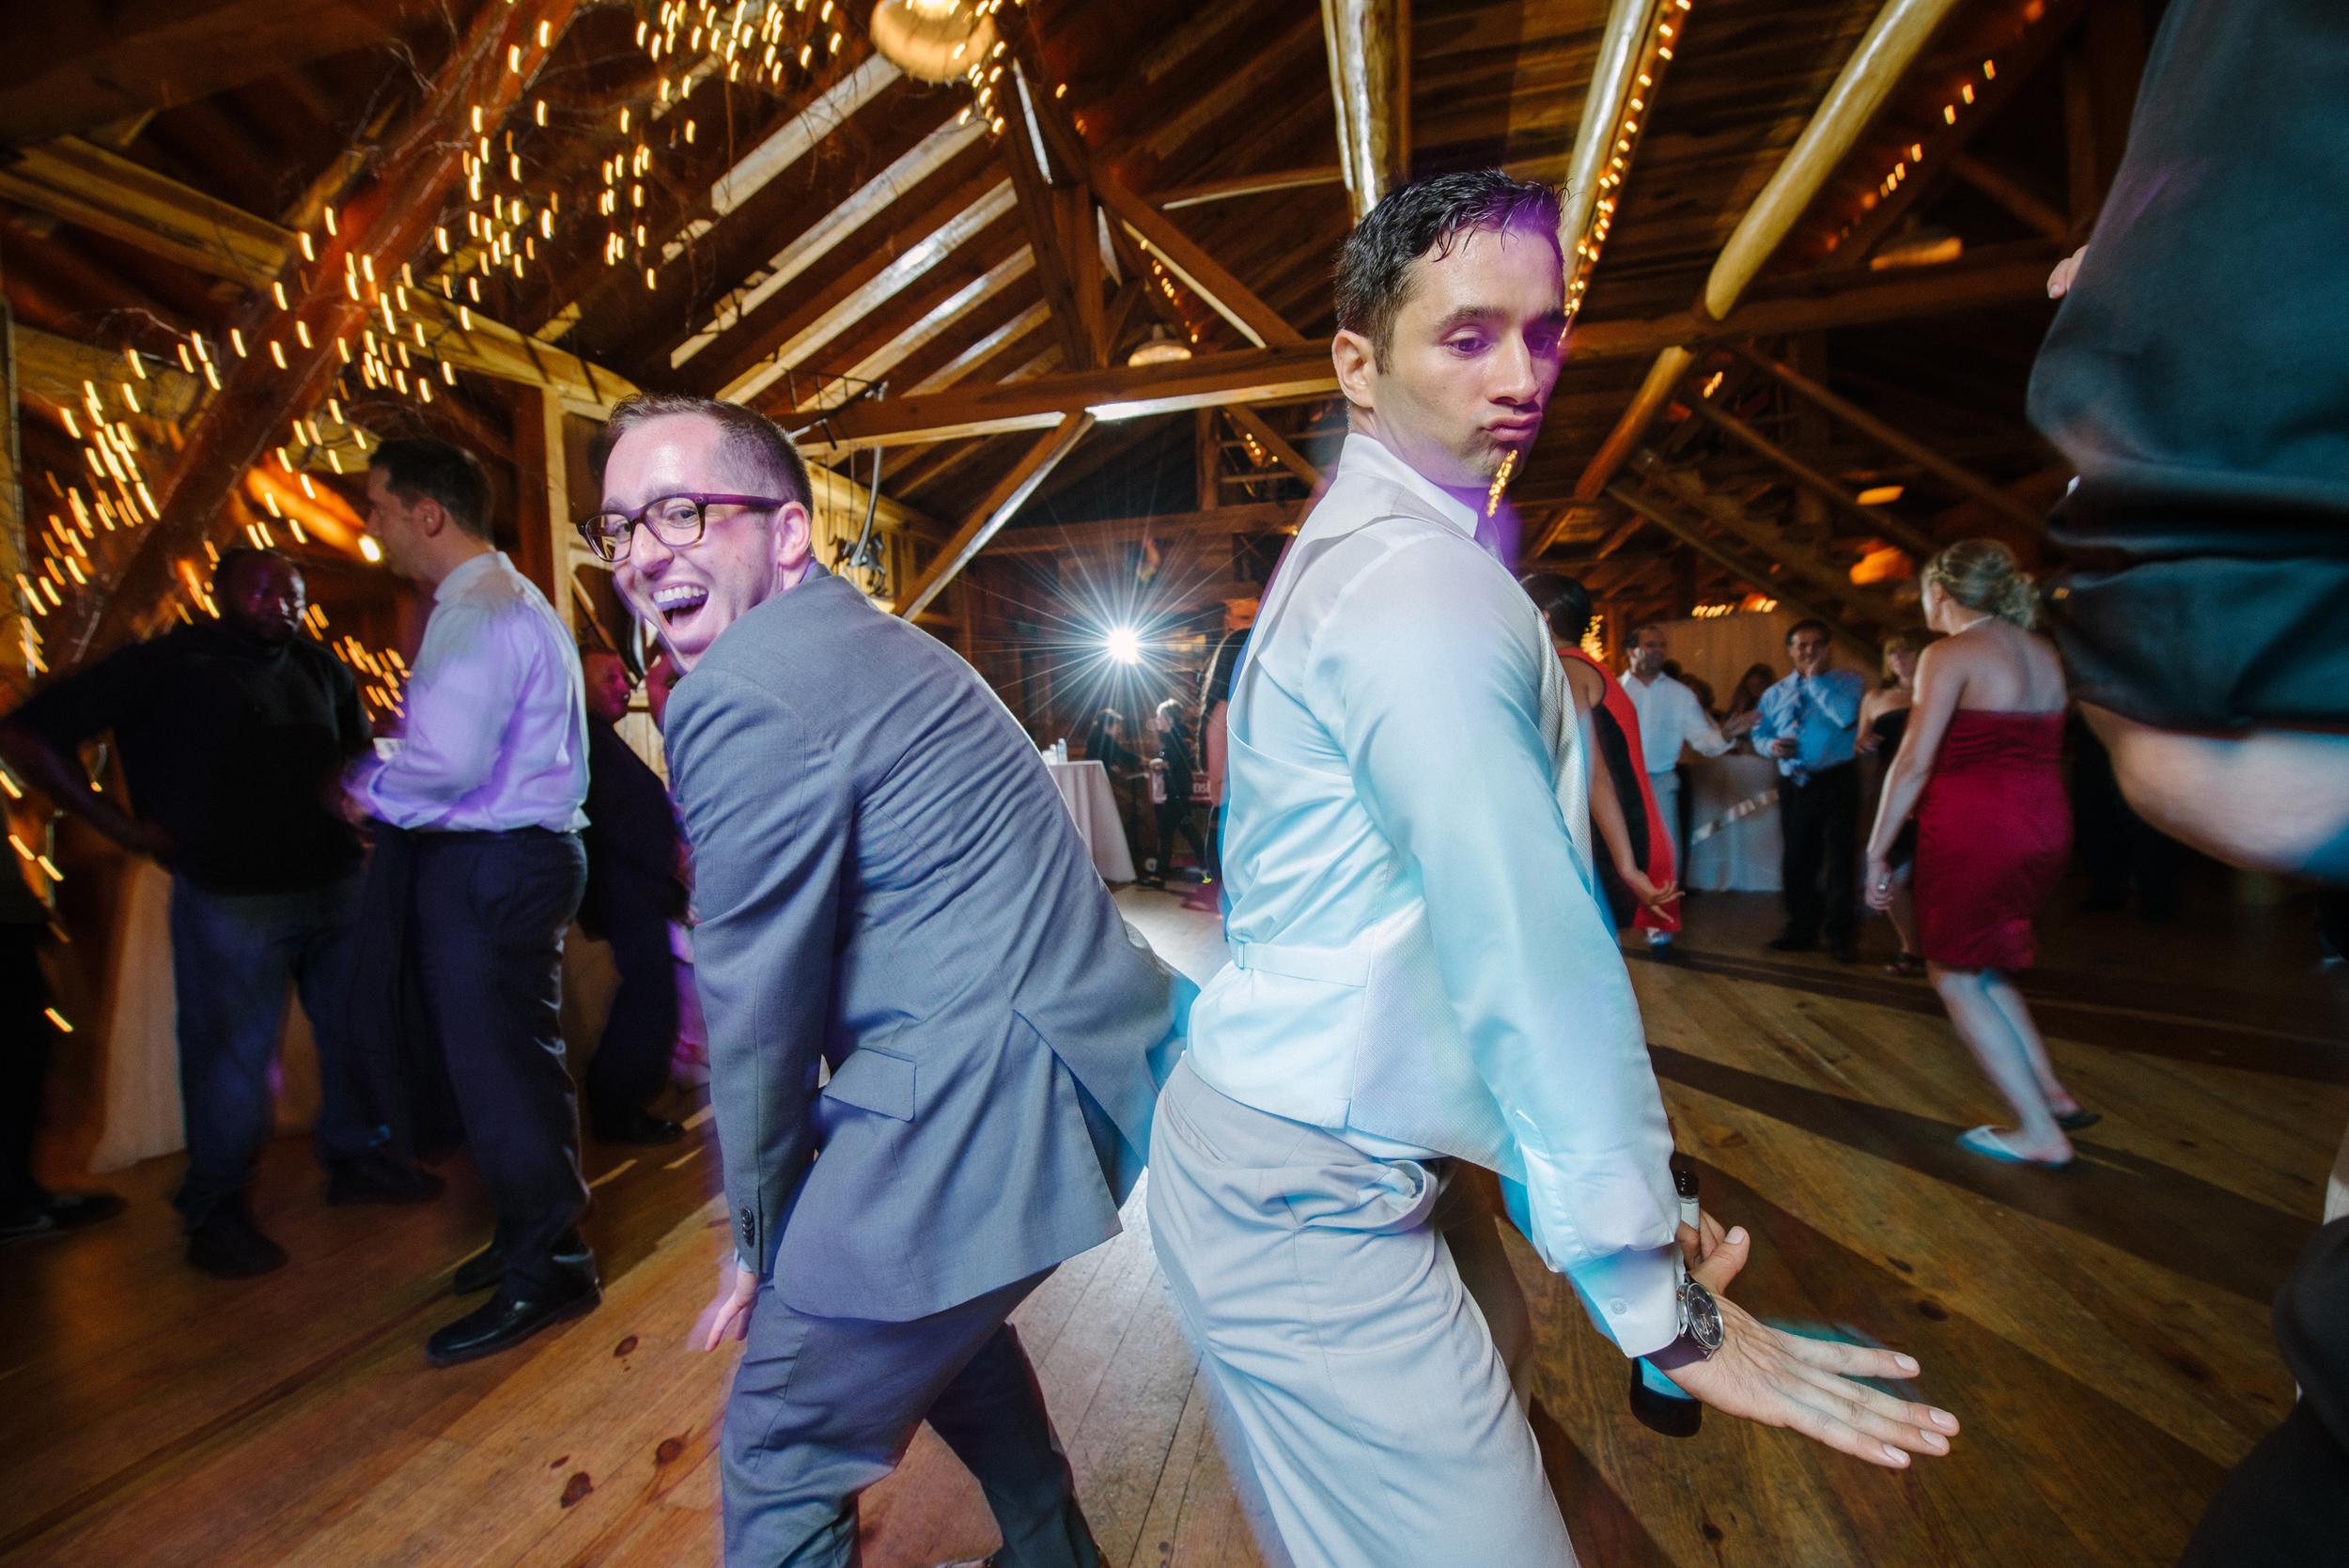 Matt_Swetel_Photography_Erin_and_Jeff_married053.jpg